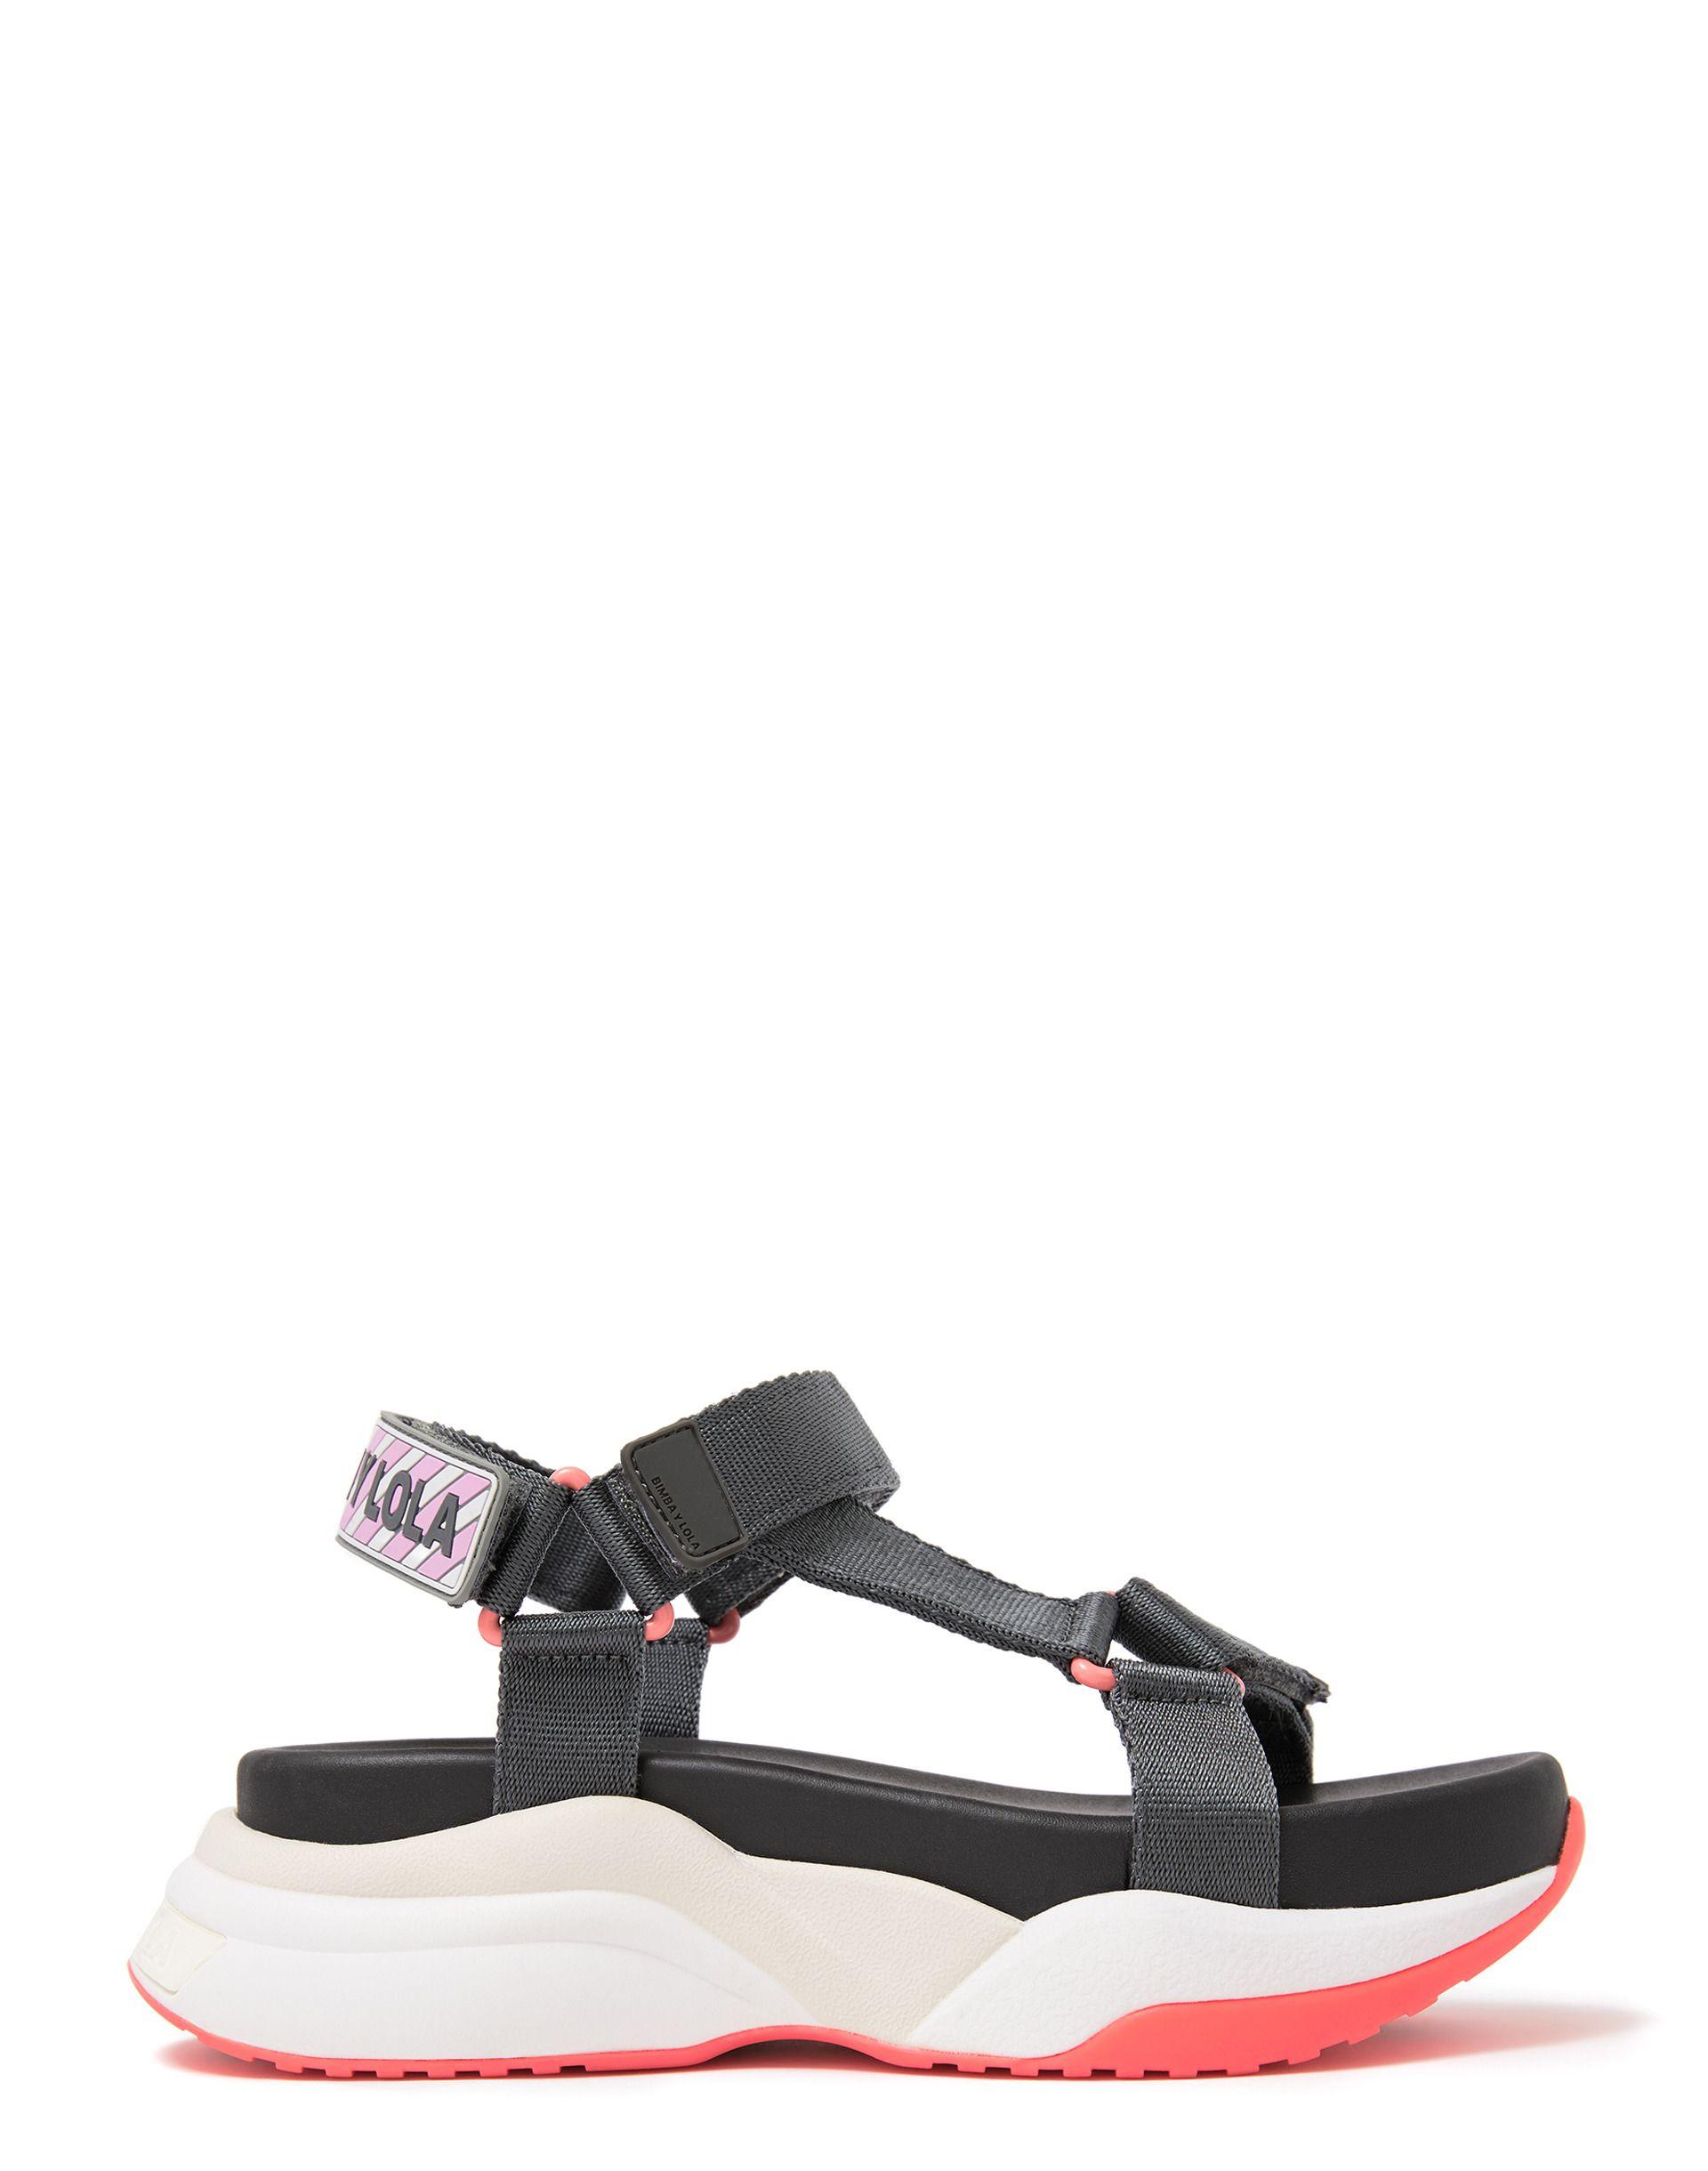 Grey chunky sandal